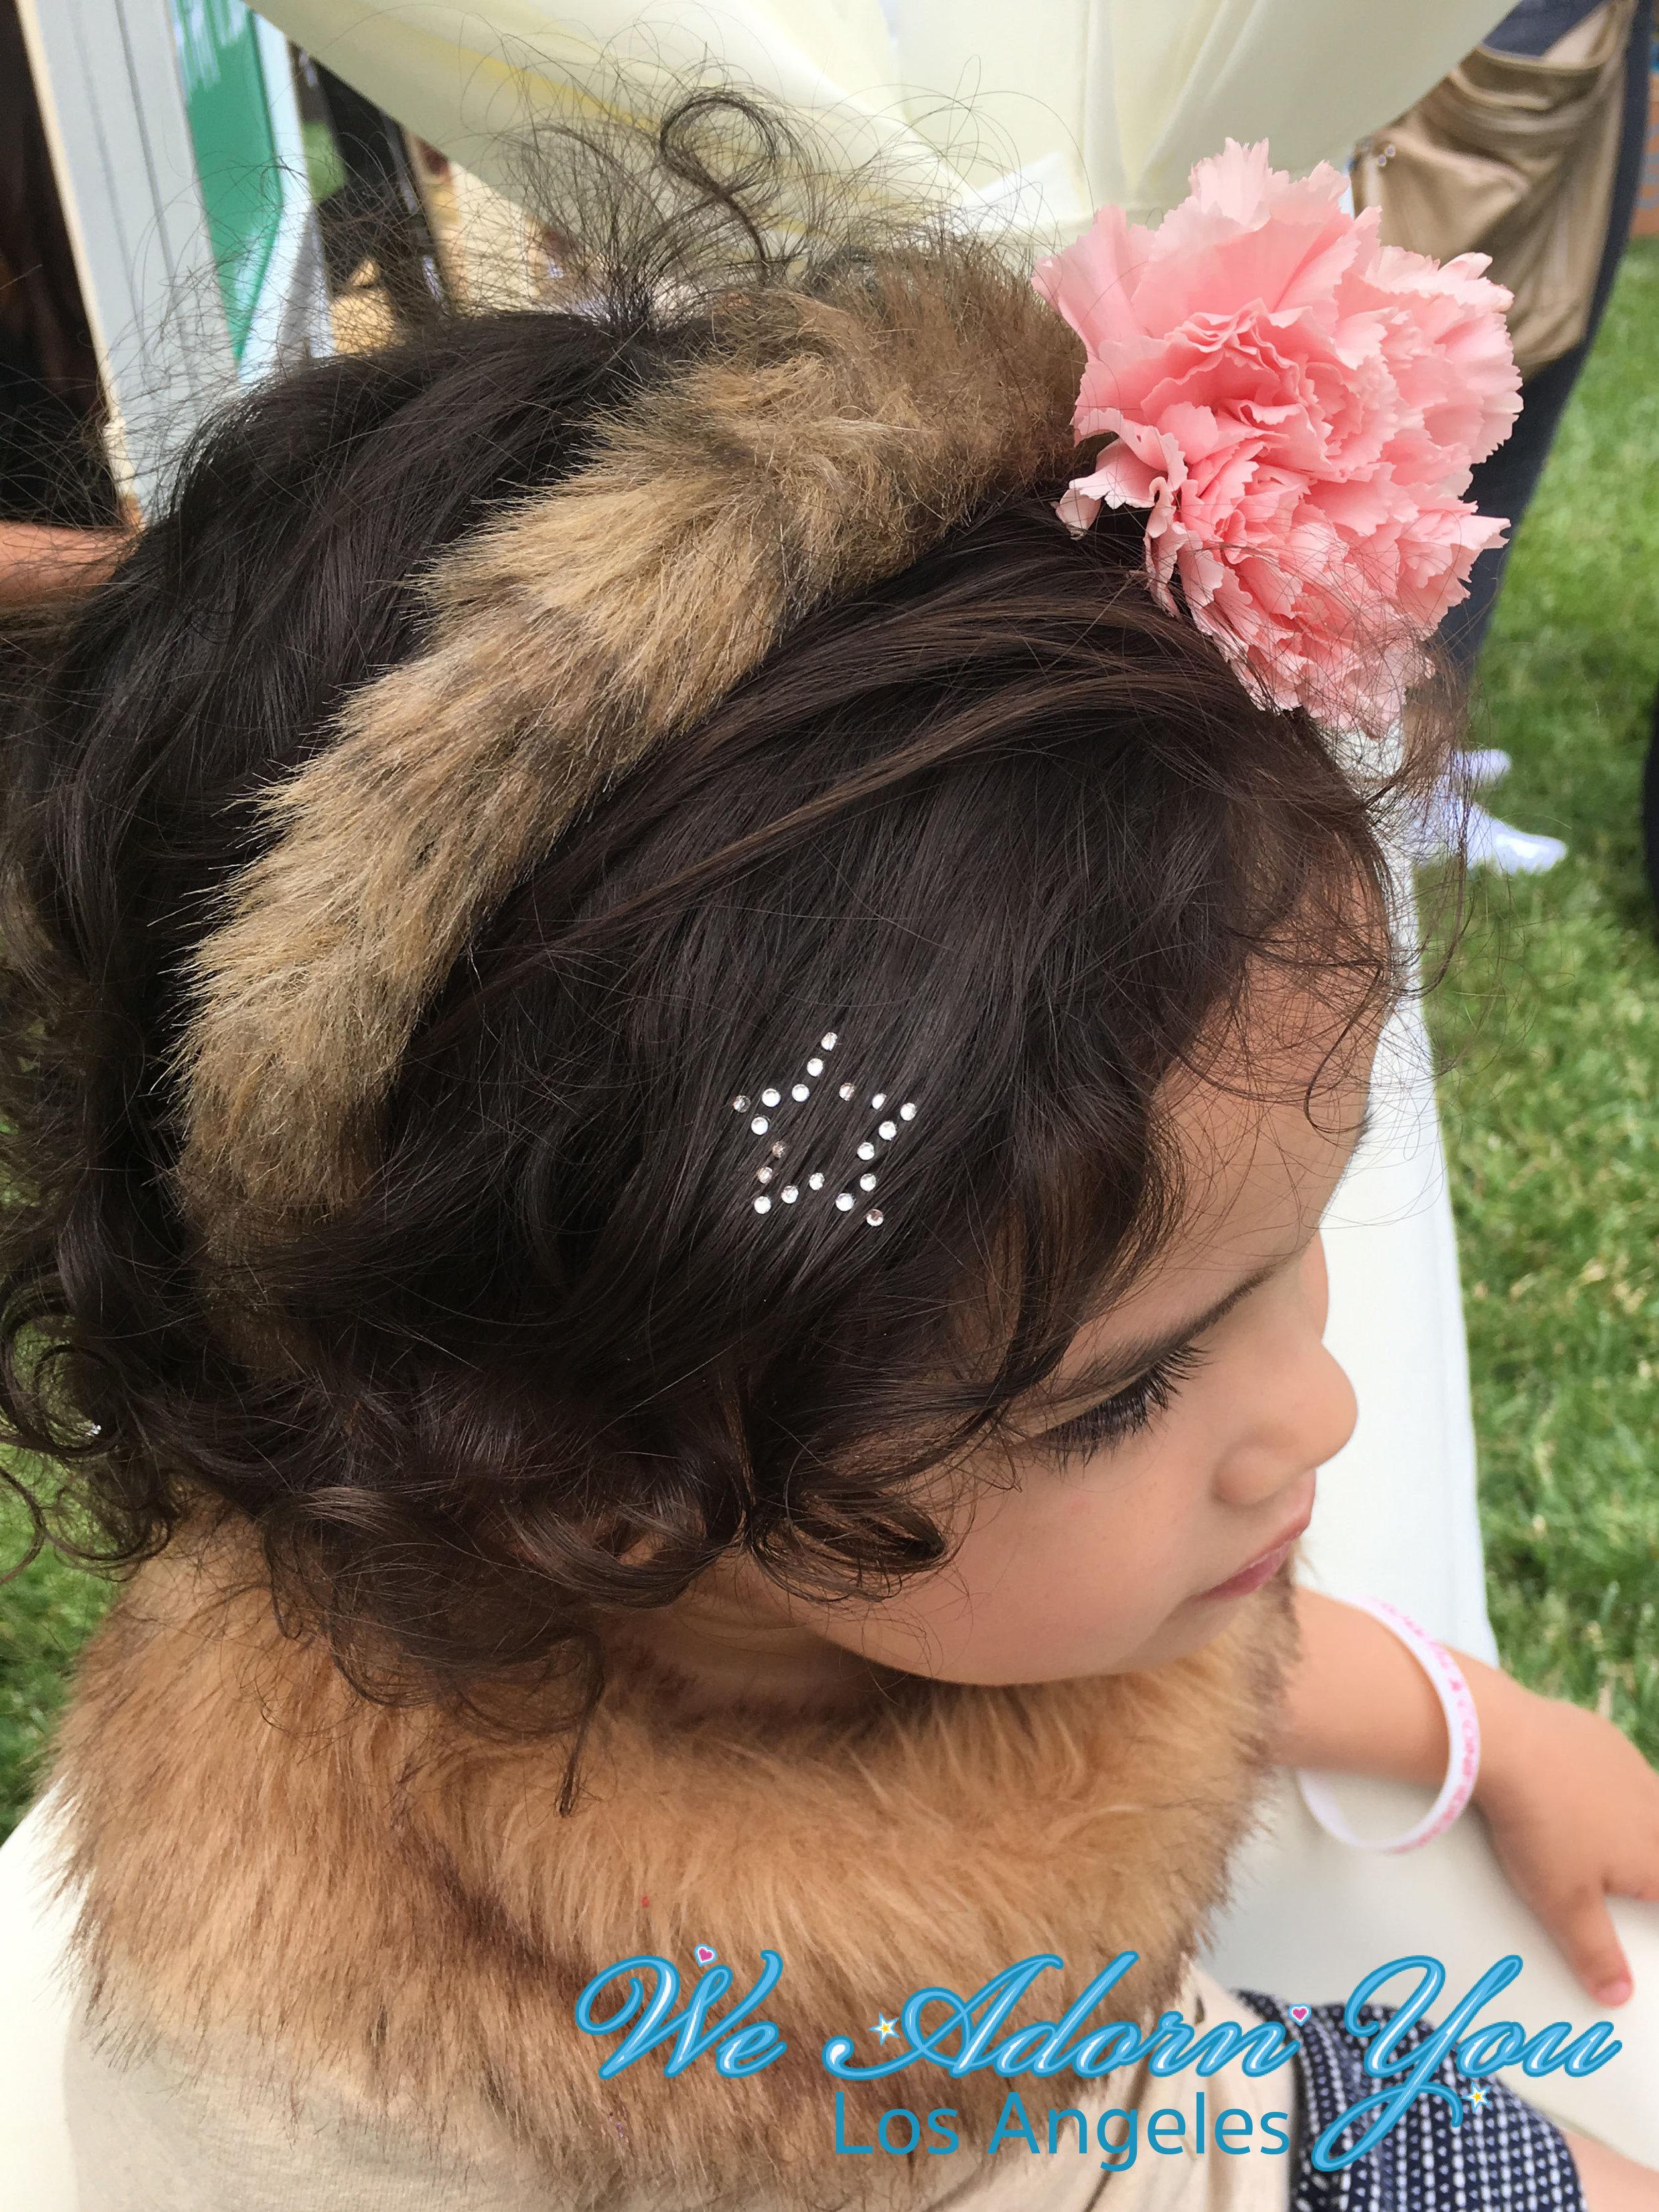 We Adorn You Los Angeles Hair Crystals Star.jpg